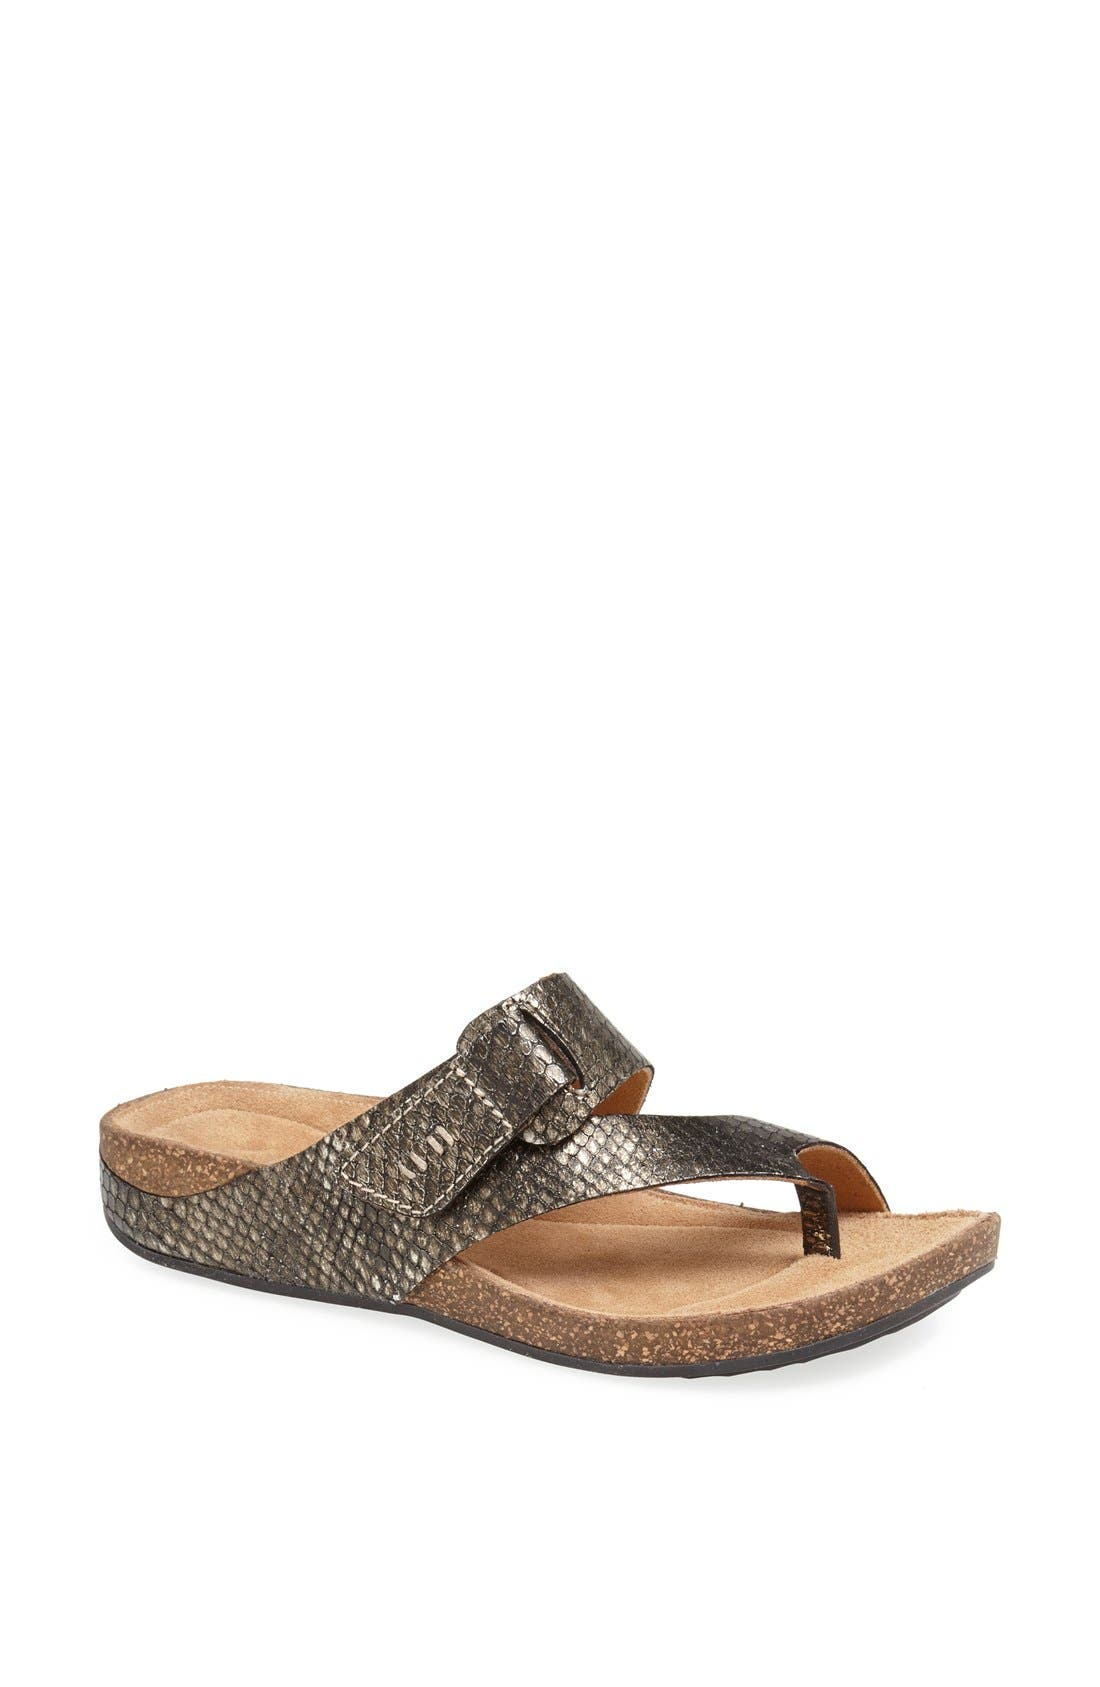 Alternate Image 1 Selected - Clarks® 'Perri Coast' Leather Thong Sandal